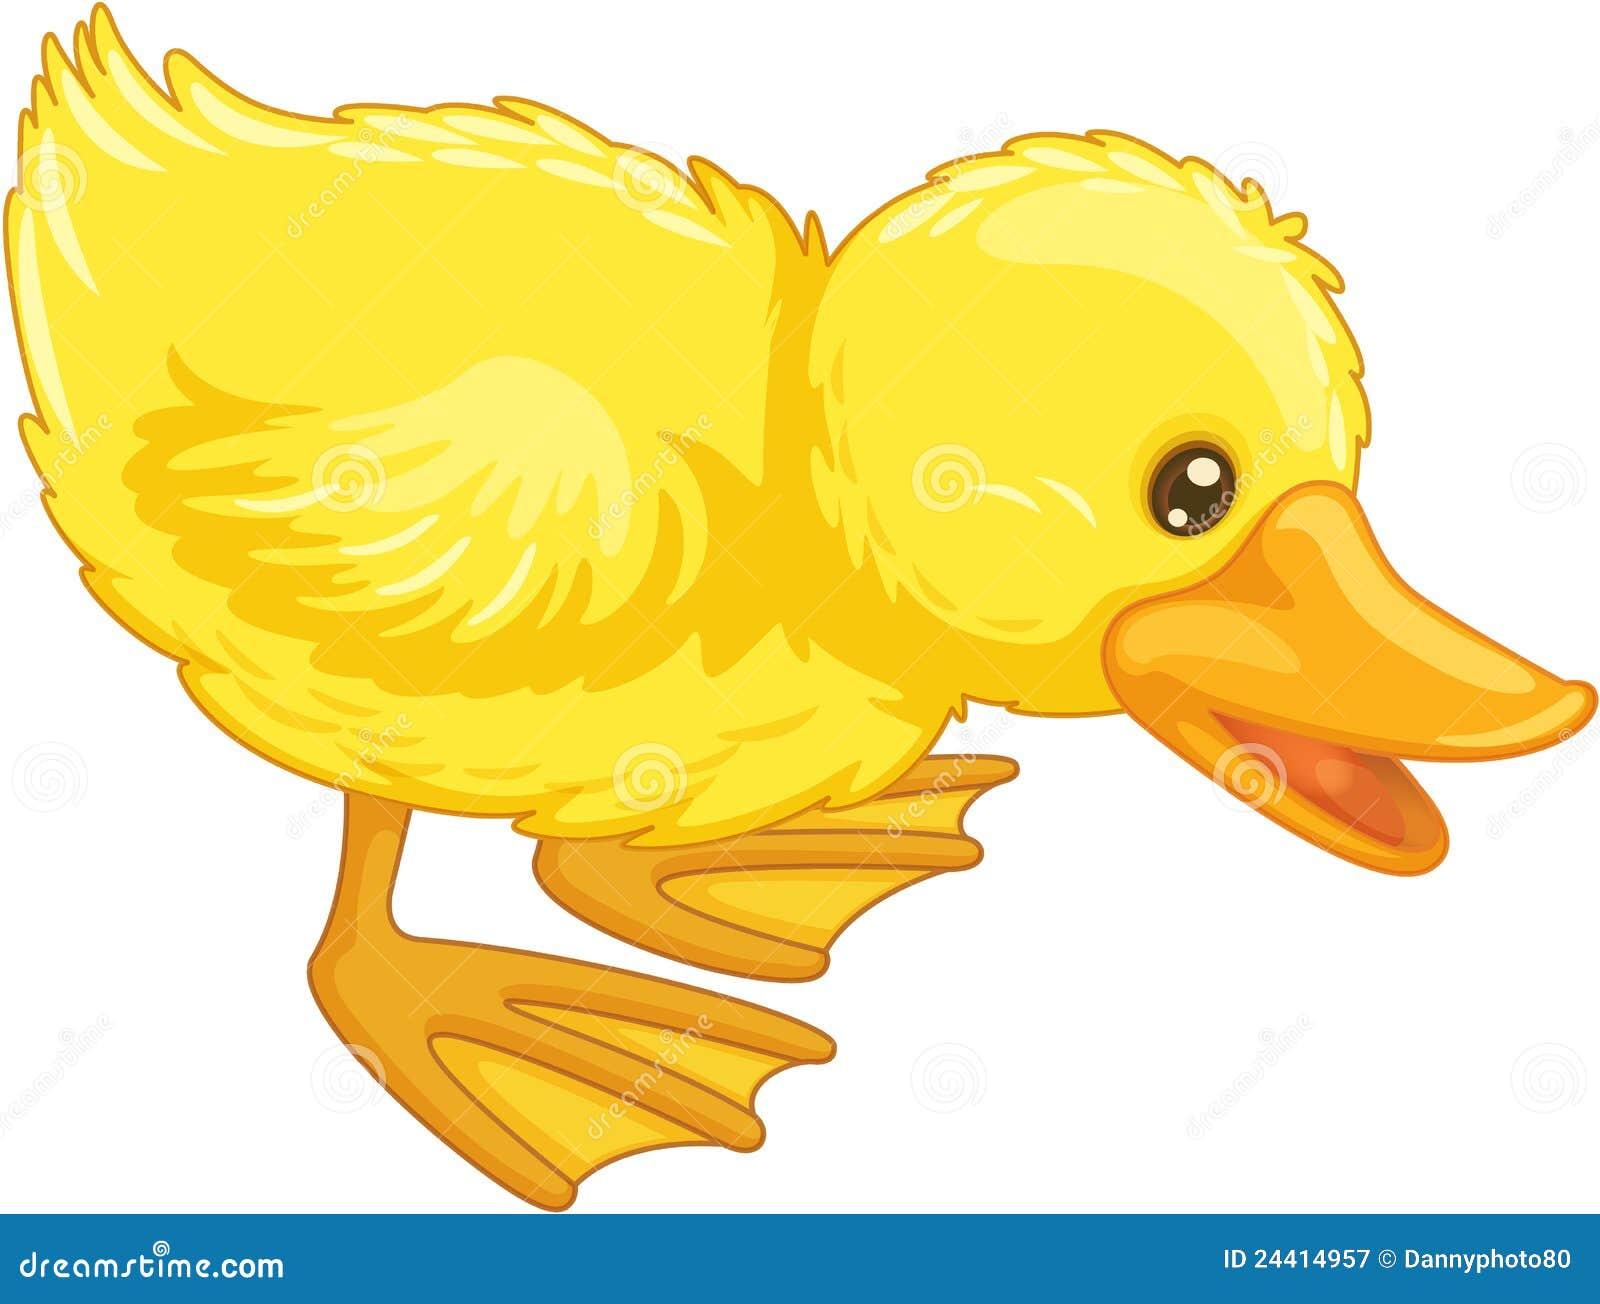 cute cartoon duck royalty free stock photography image 24414957